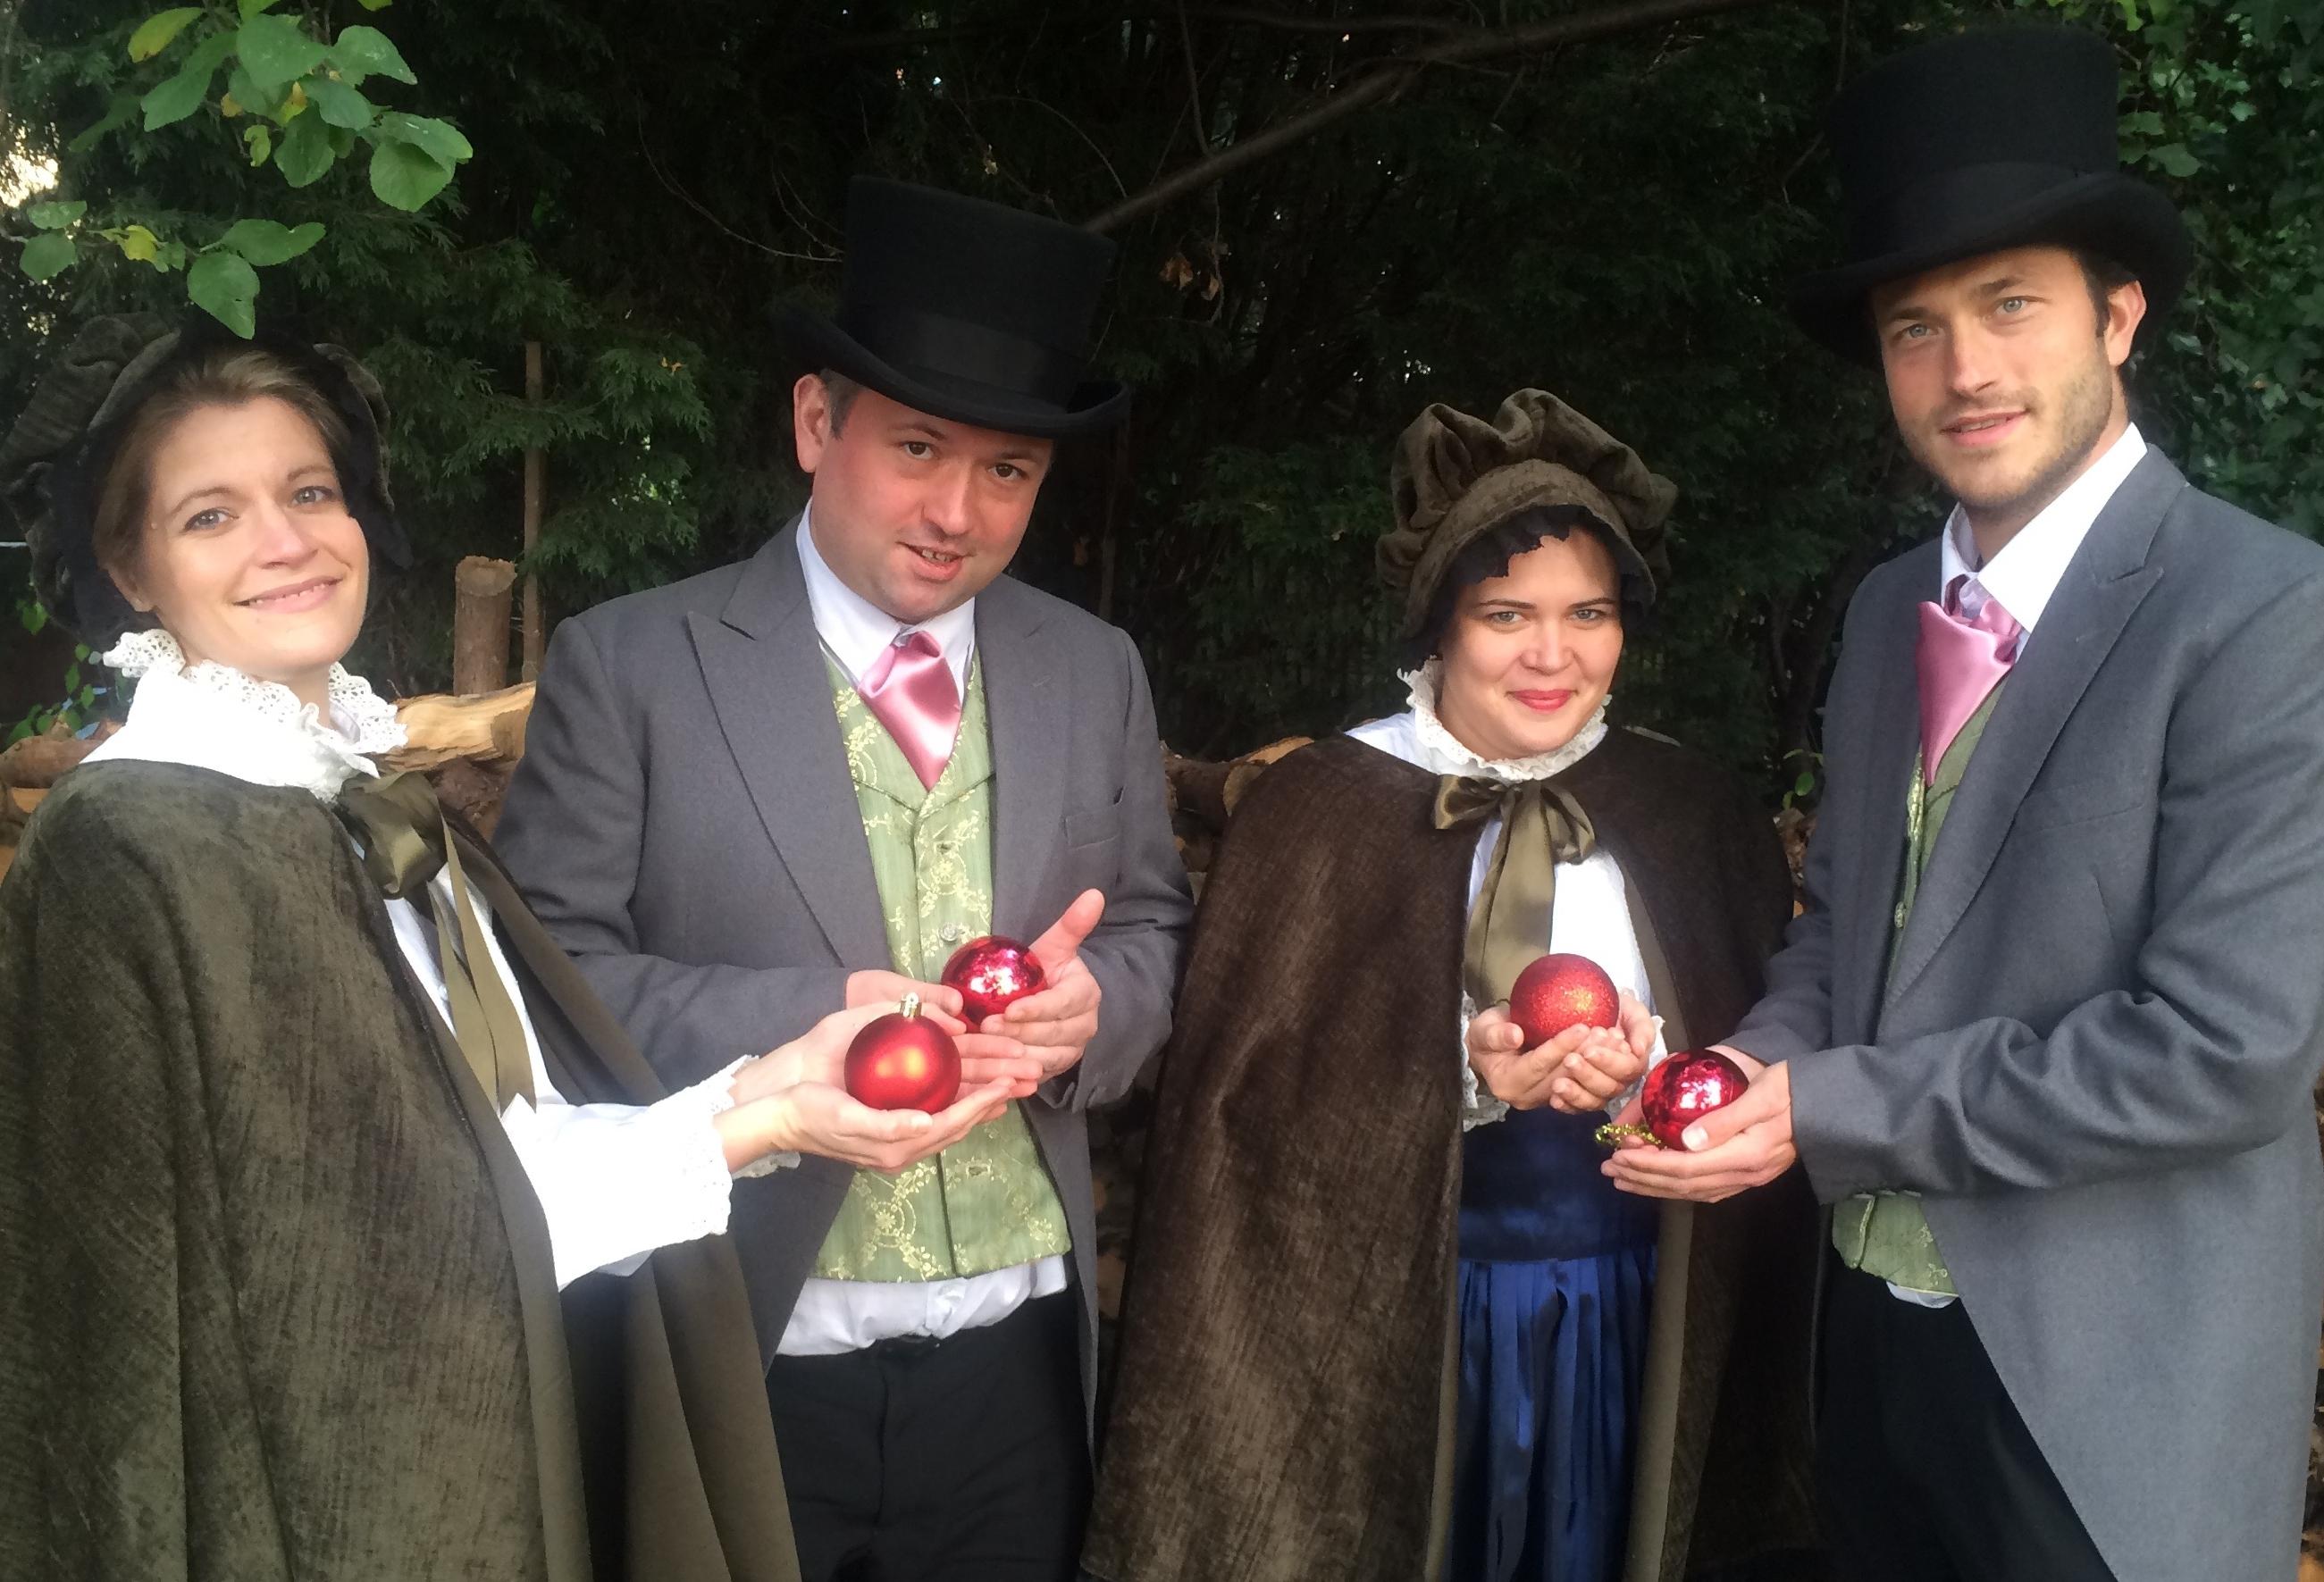 Victorian_Christmas_Carol_Singers_hire 2